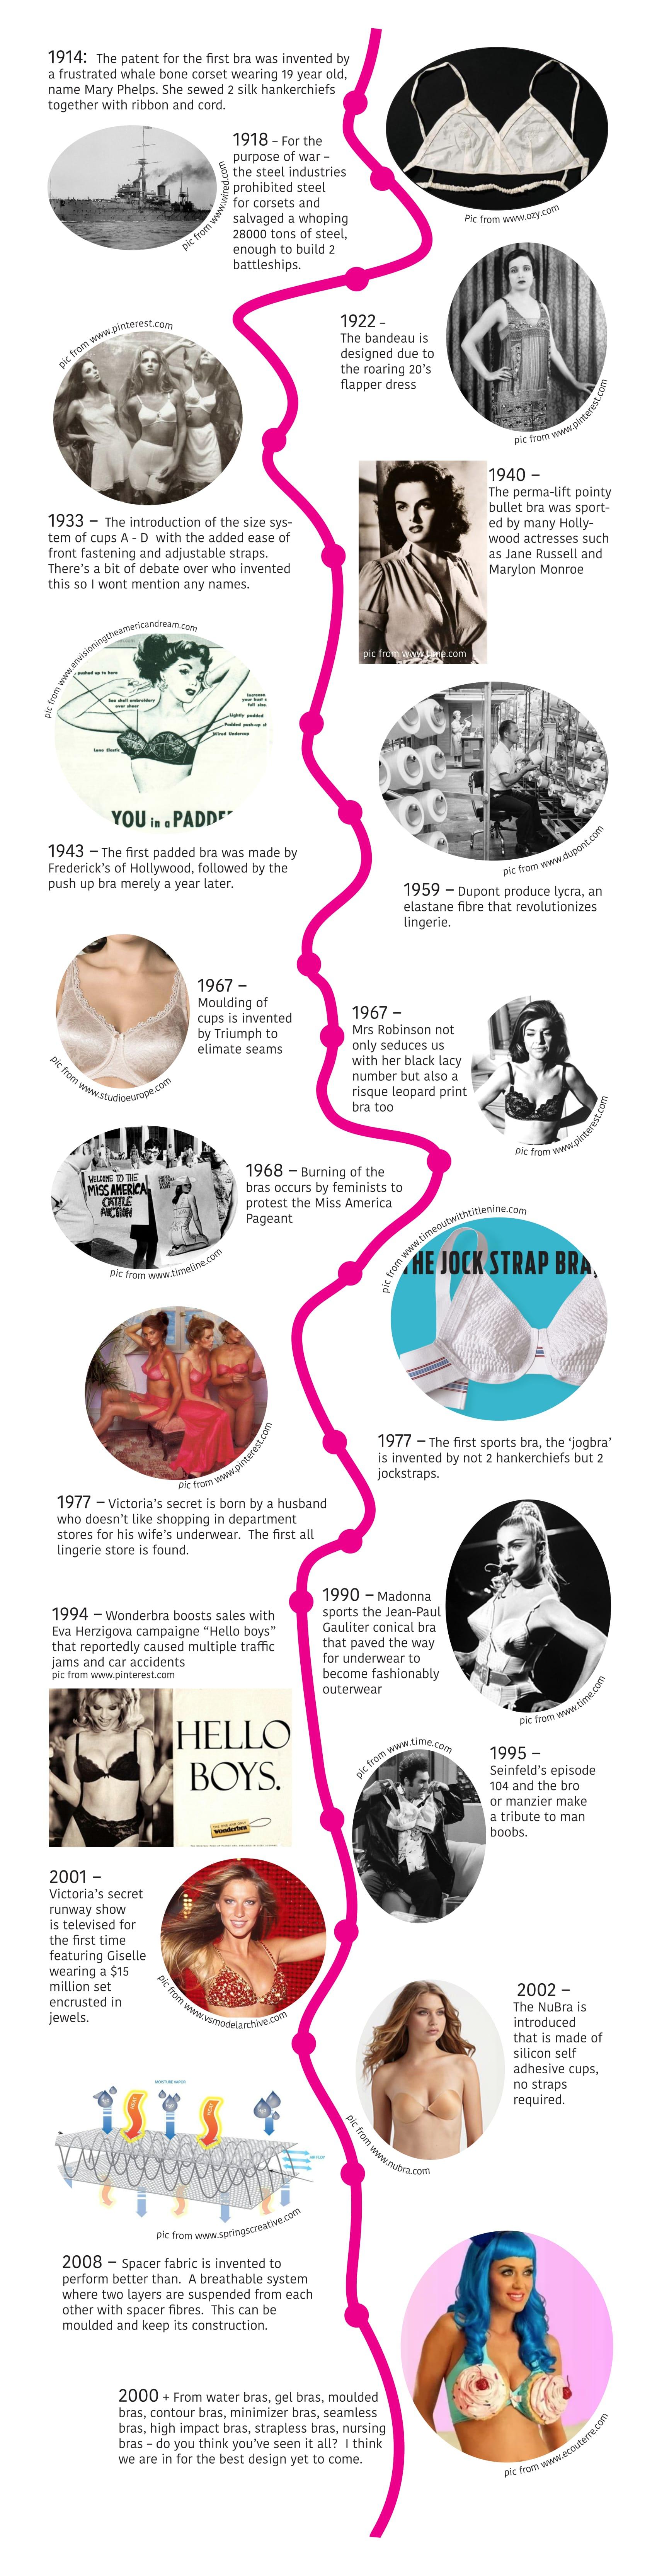 History of Bra